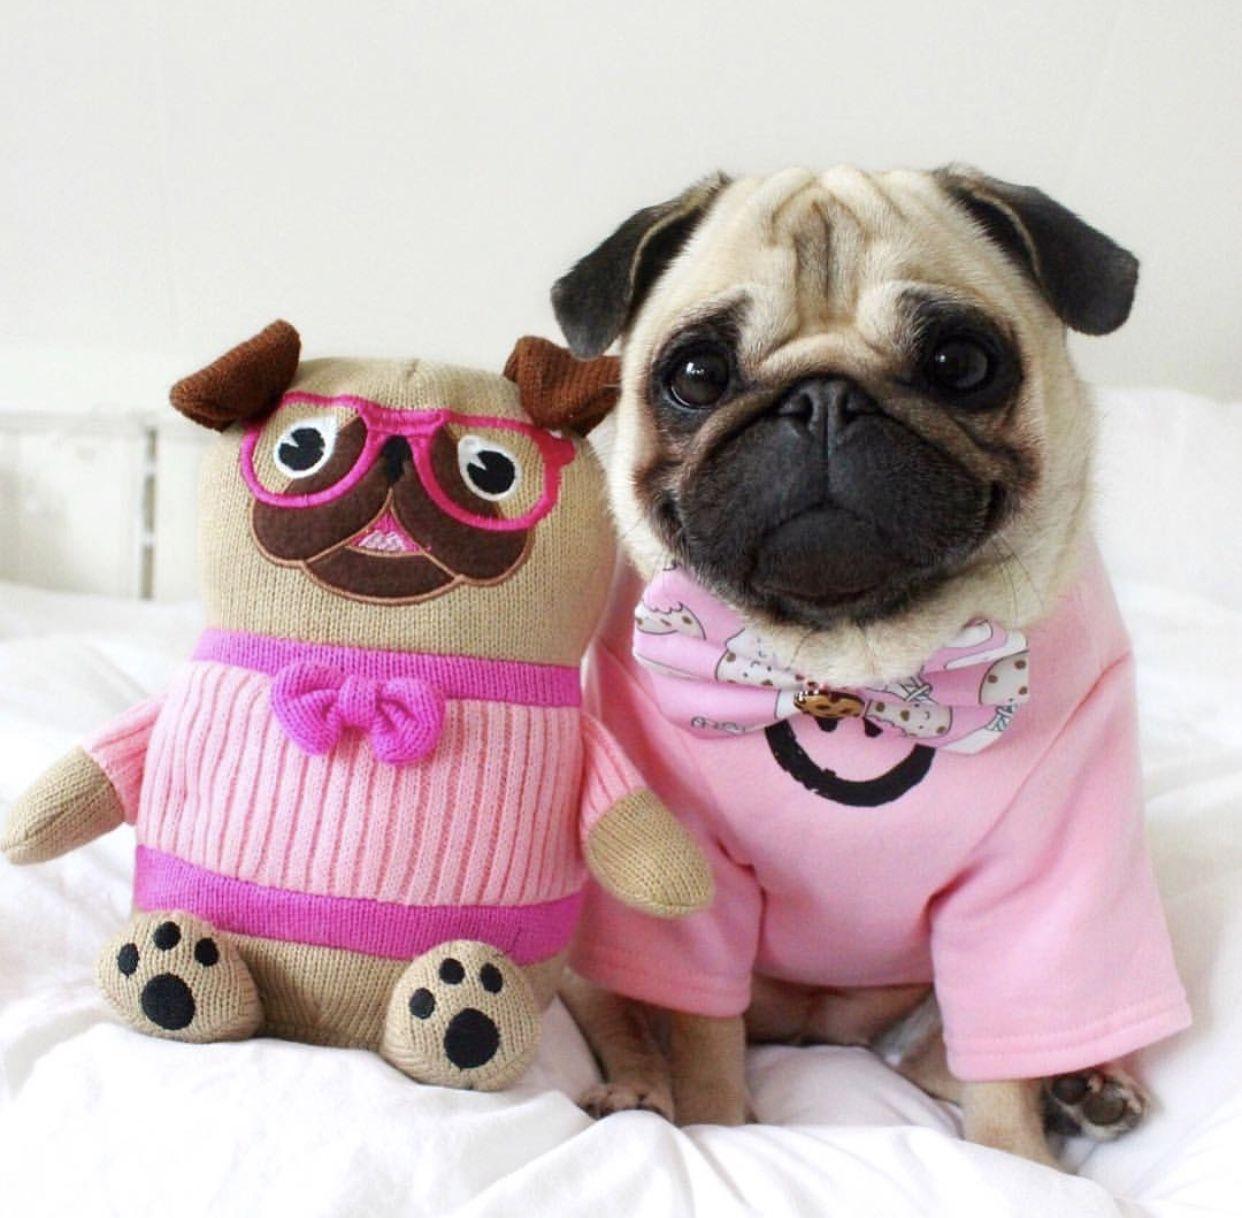 Pin de Linda Hanback en pugs | Pinterest | Perritos adorables, Pug y ...